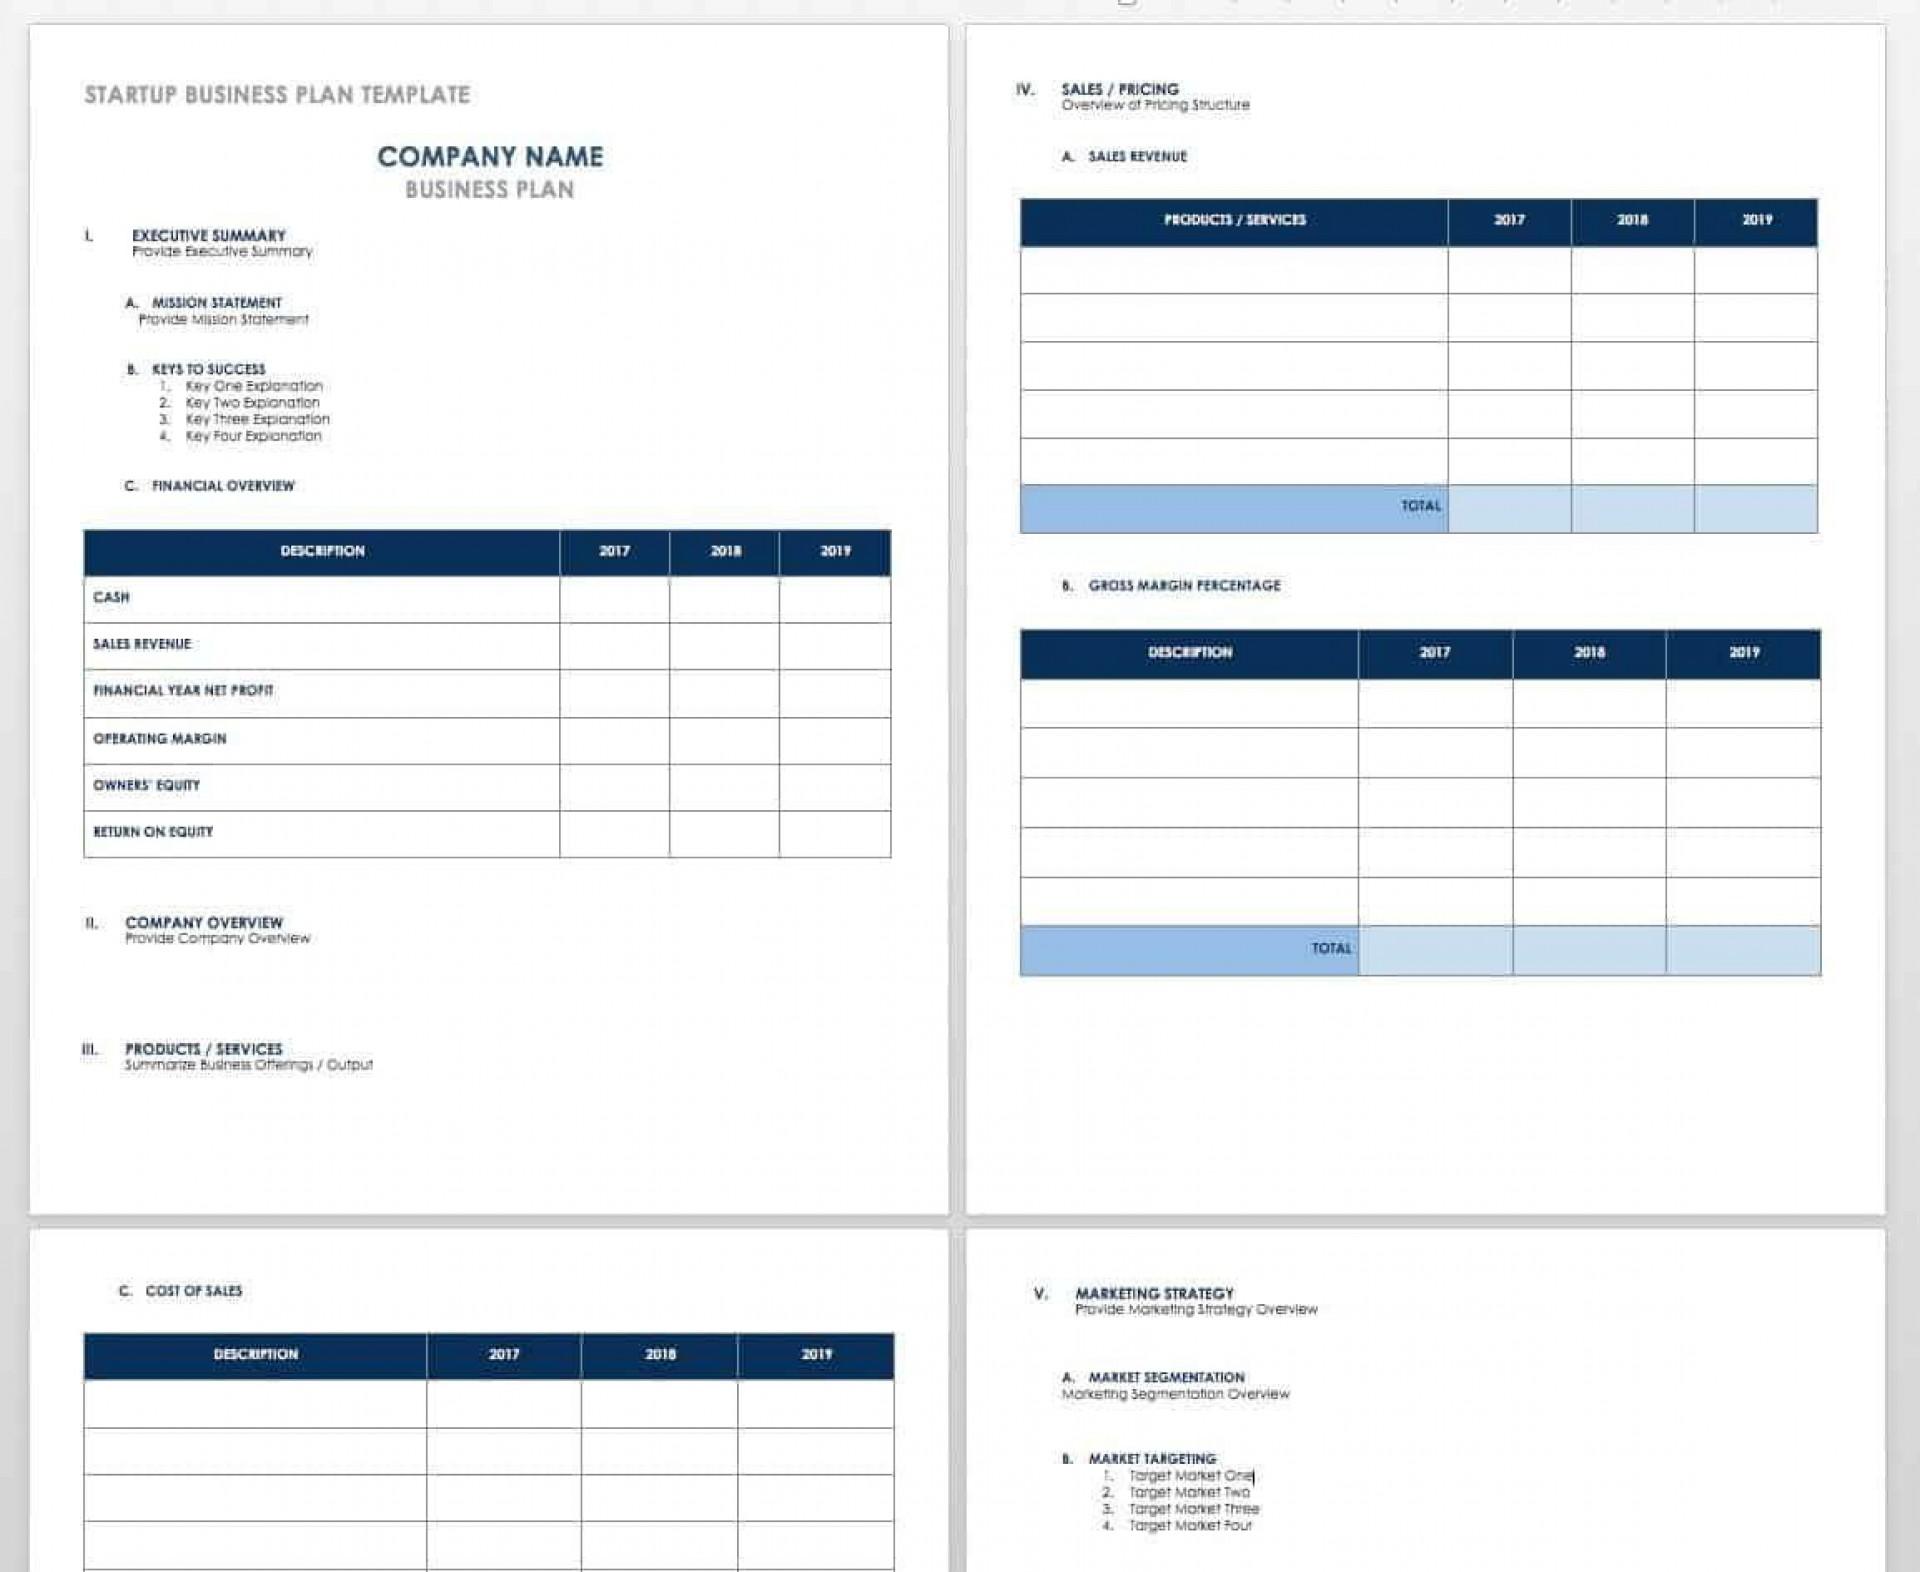 008 Singular Easy Busines Plan Template High Resolution  For Free Basic Sample Pdf1920